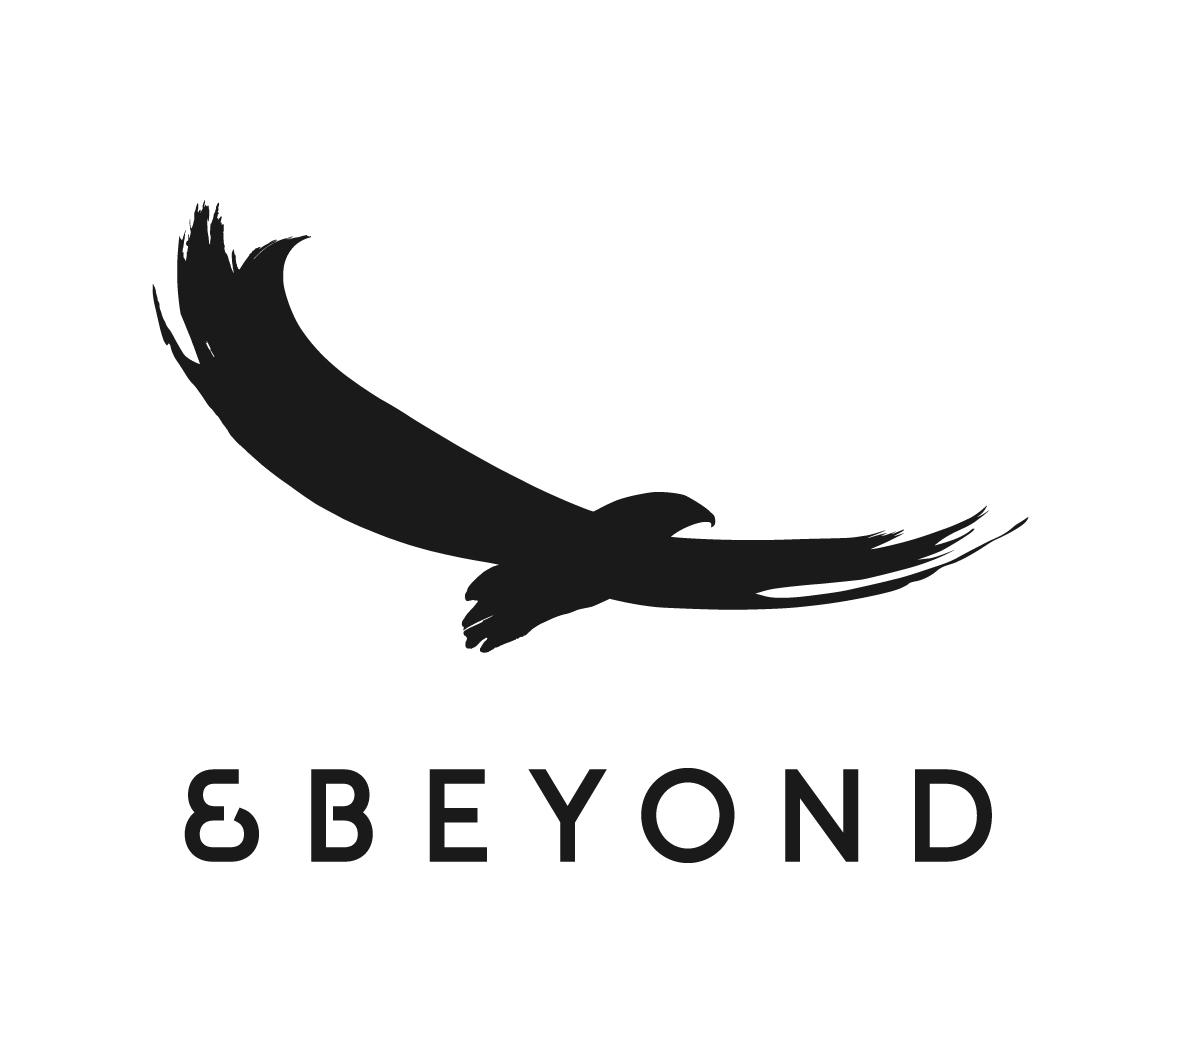 47fe42ad-b771-4ea4-b52f-e8d425766fd5andbeyond-logo-sep-2012.jpg